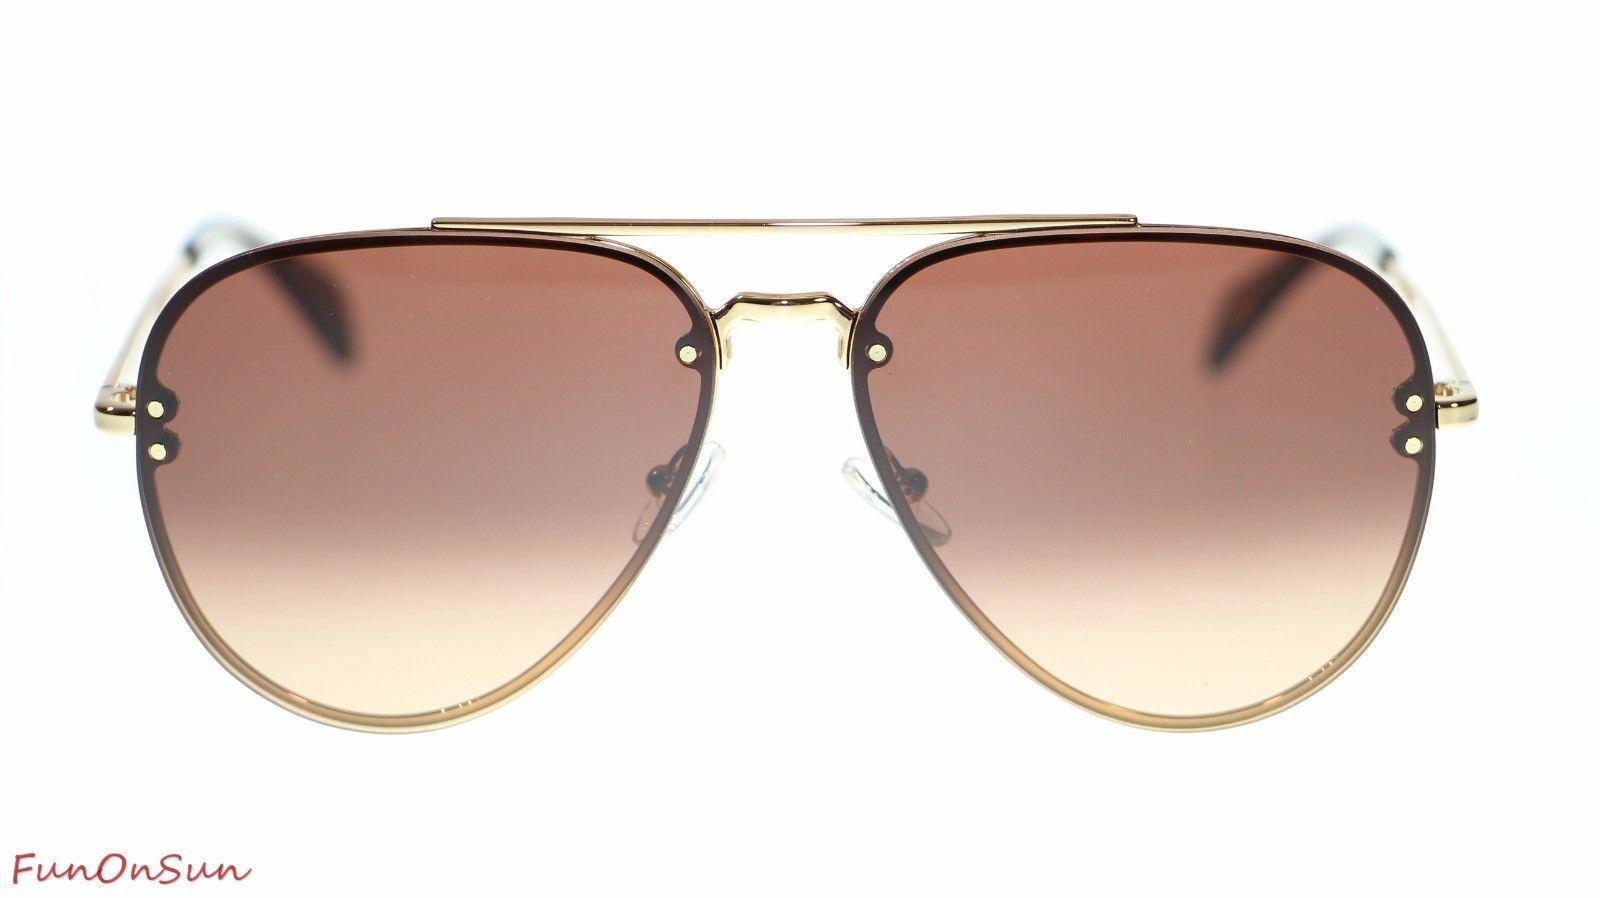 2217b01ef7b S l1600. S l1600. Previous. Celine Unisex Sunglasses Cl41392 J5G US Gold  Brown Degrade Lens Aviator 58mm